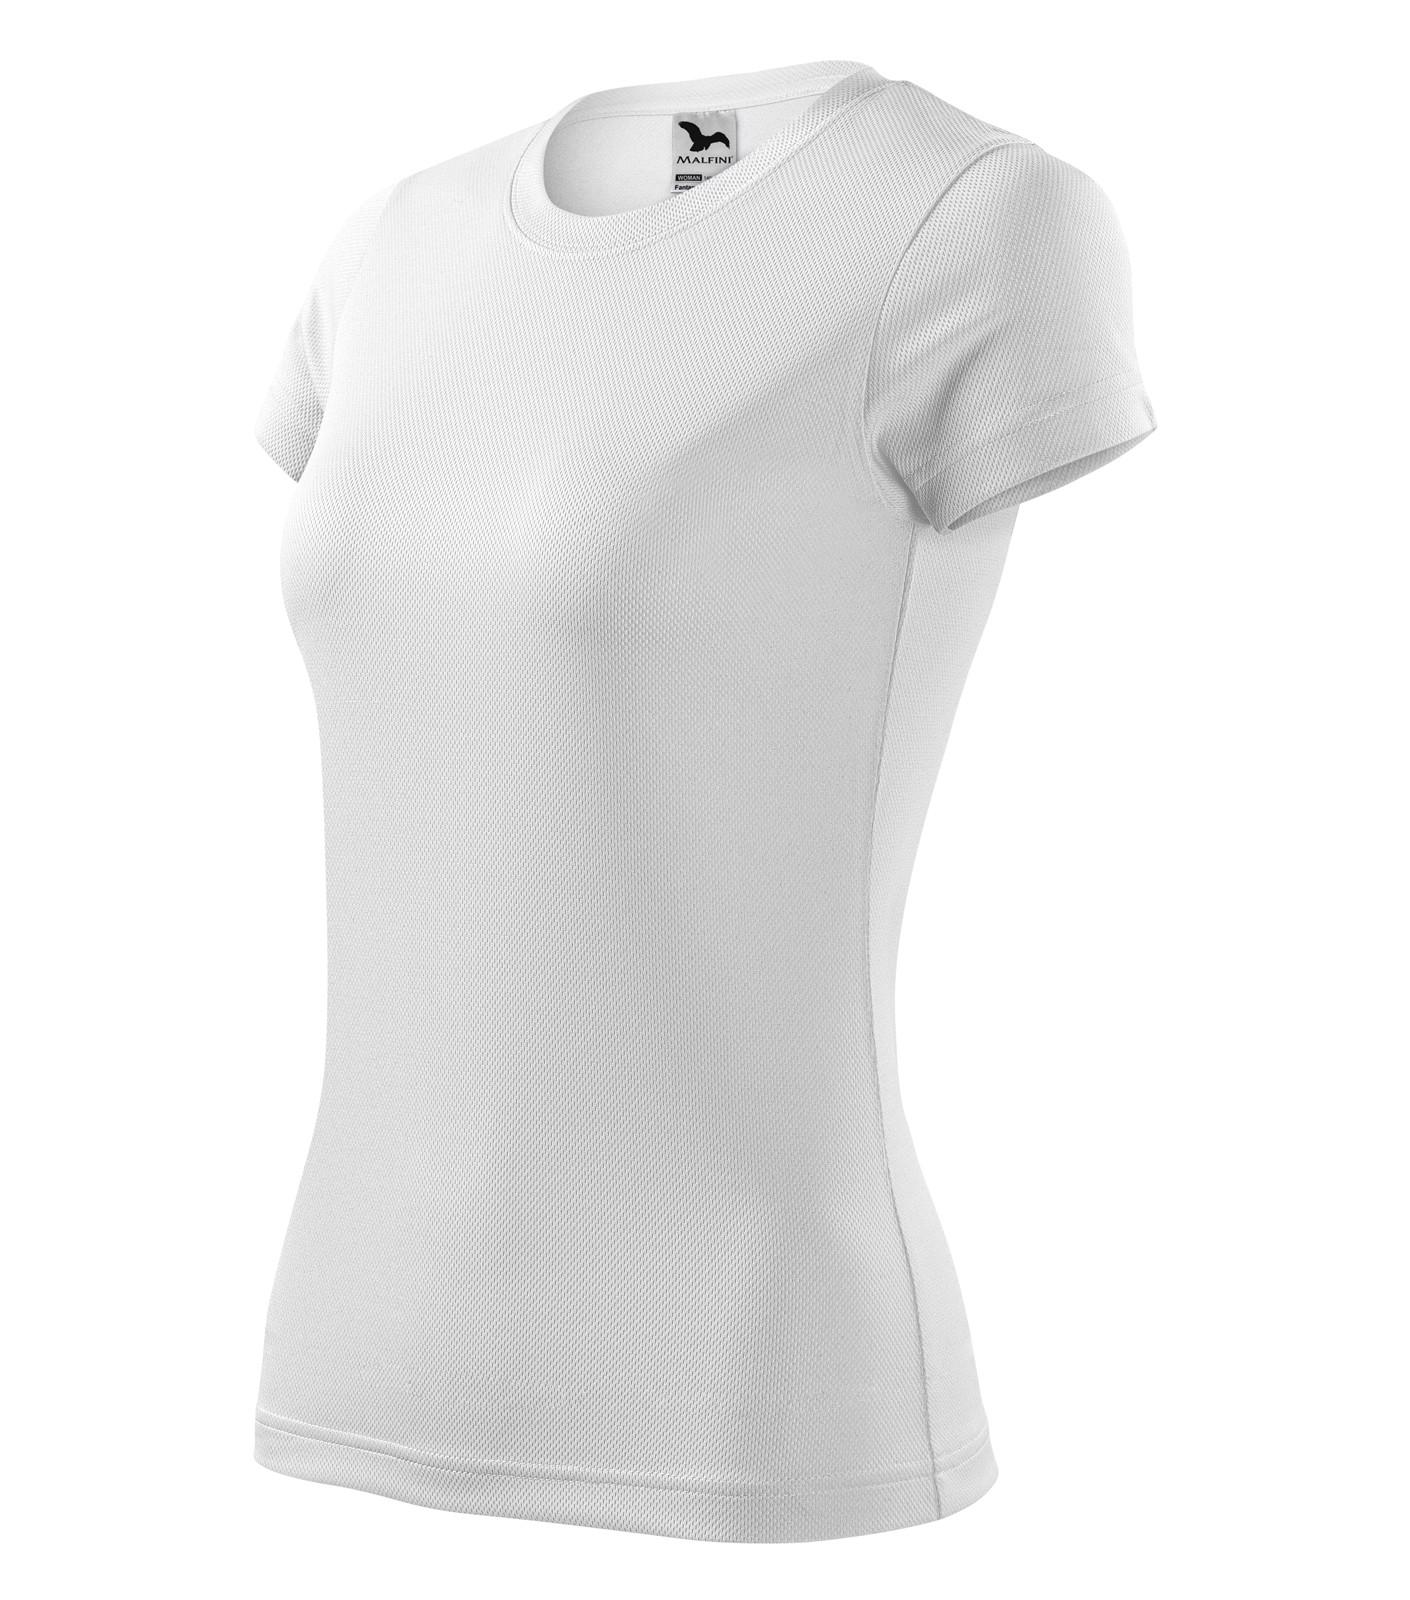 T-shirt women's Malfini Fantasy - White / M